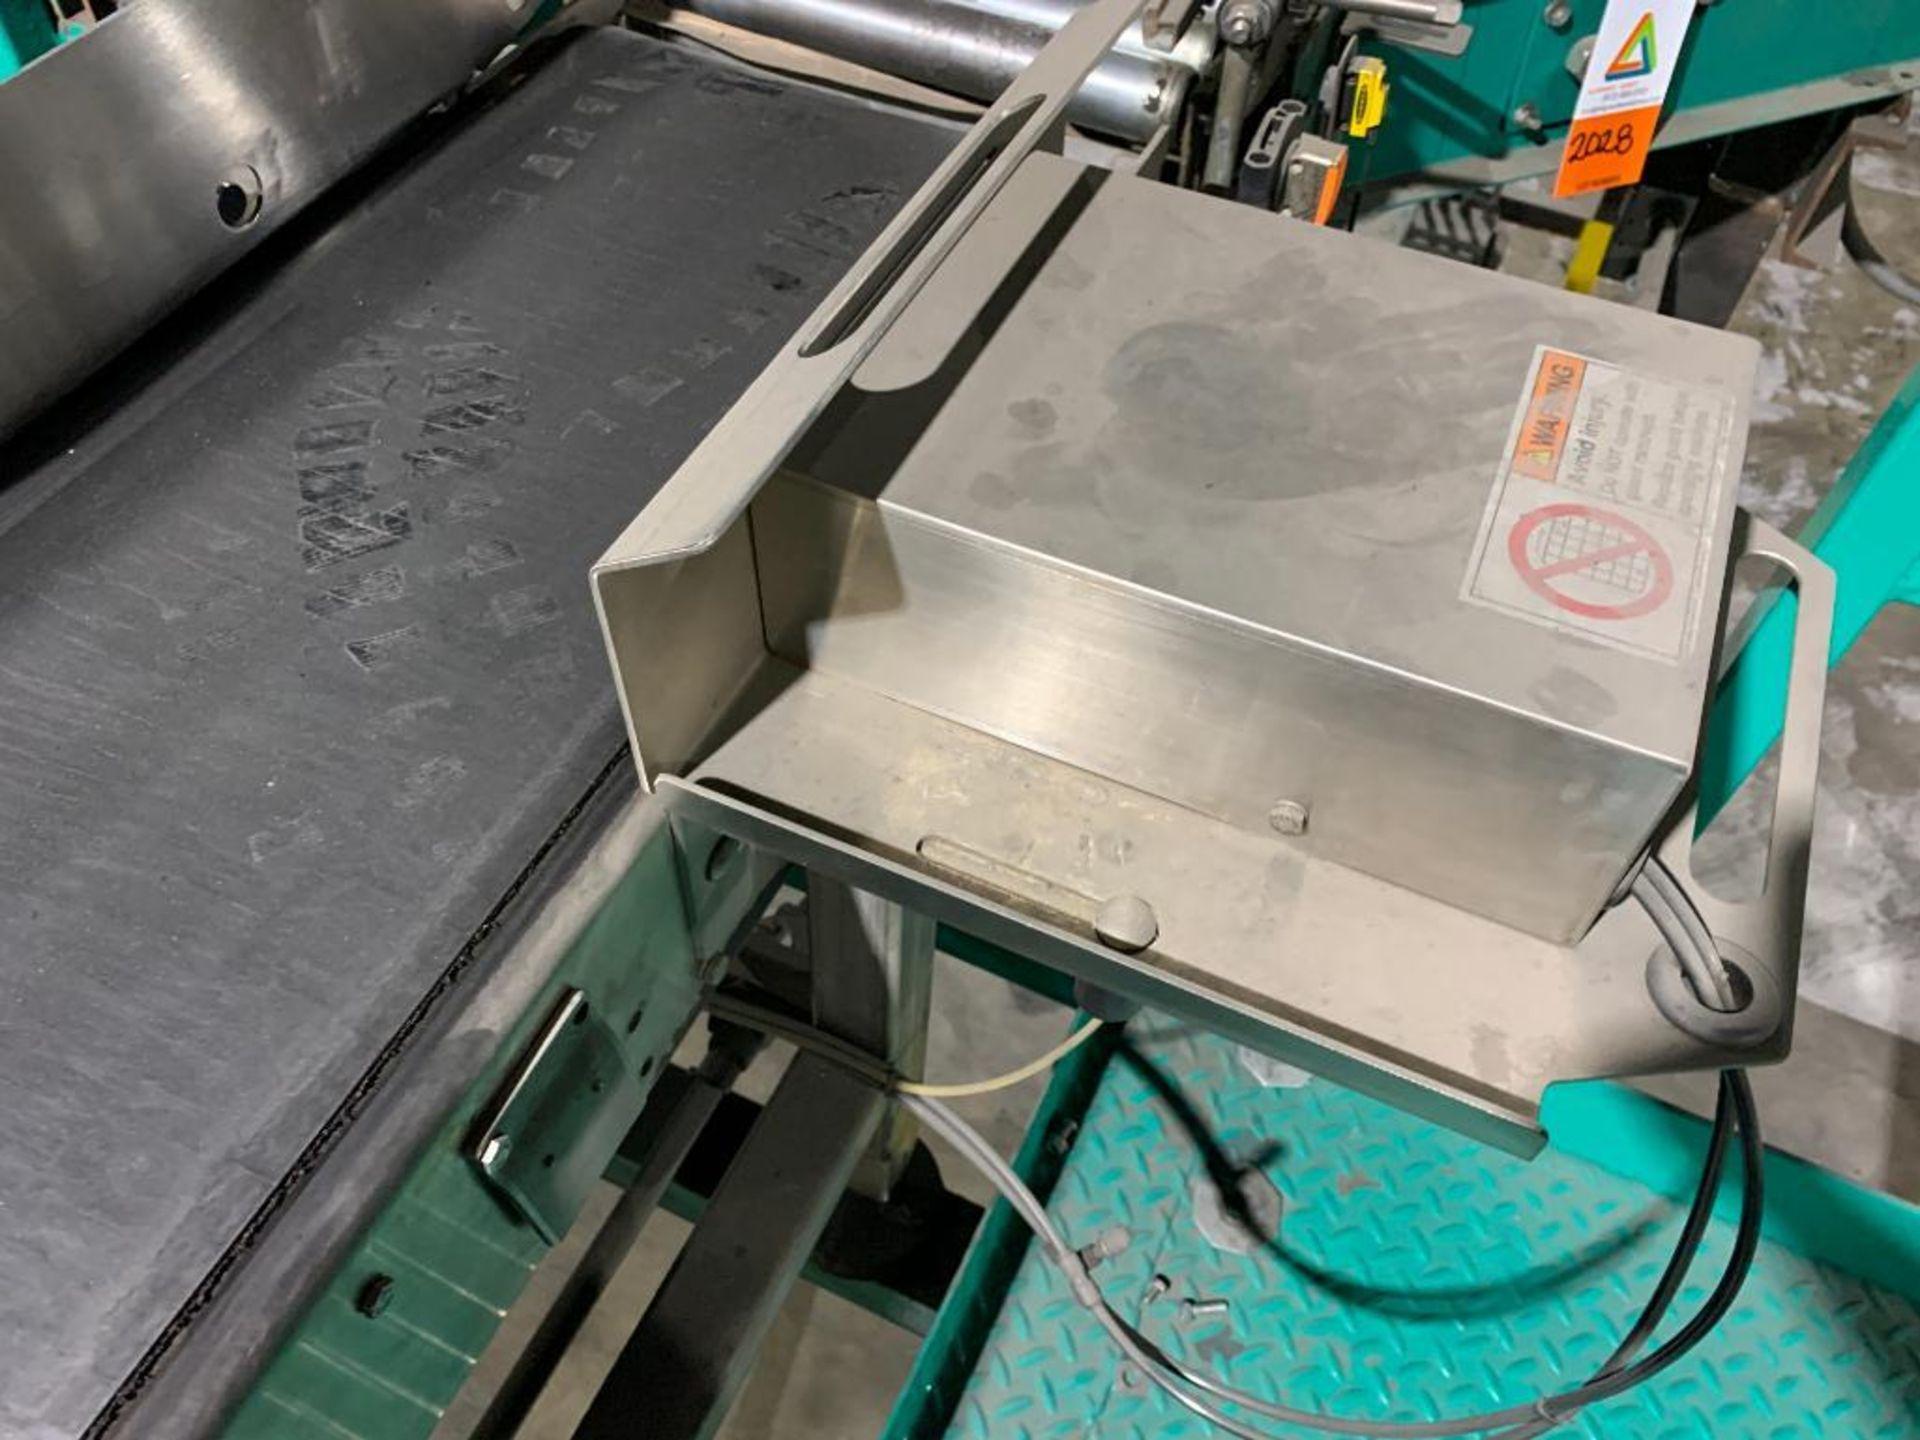 BMI stainless steel conveyor - Image 12 of 14